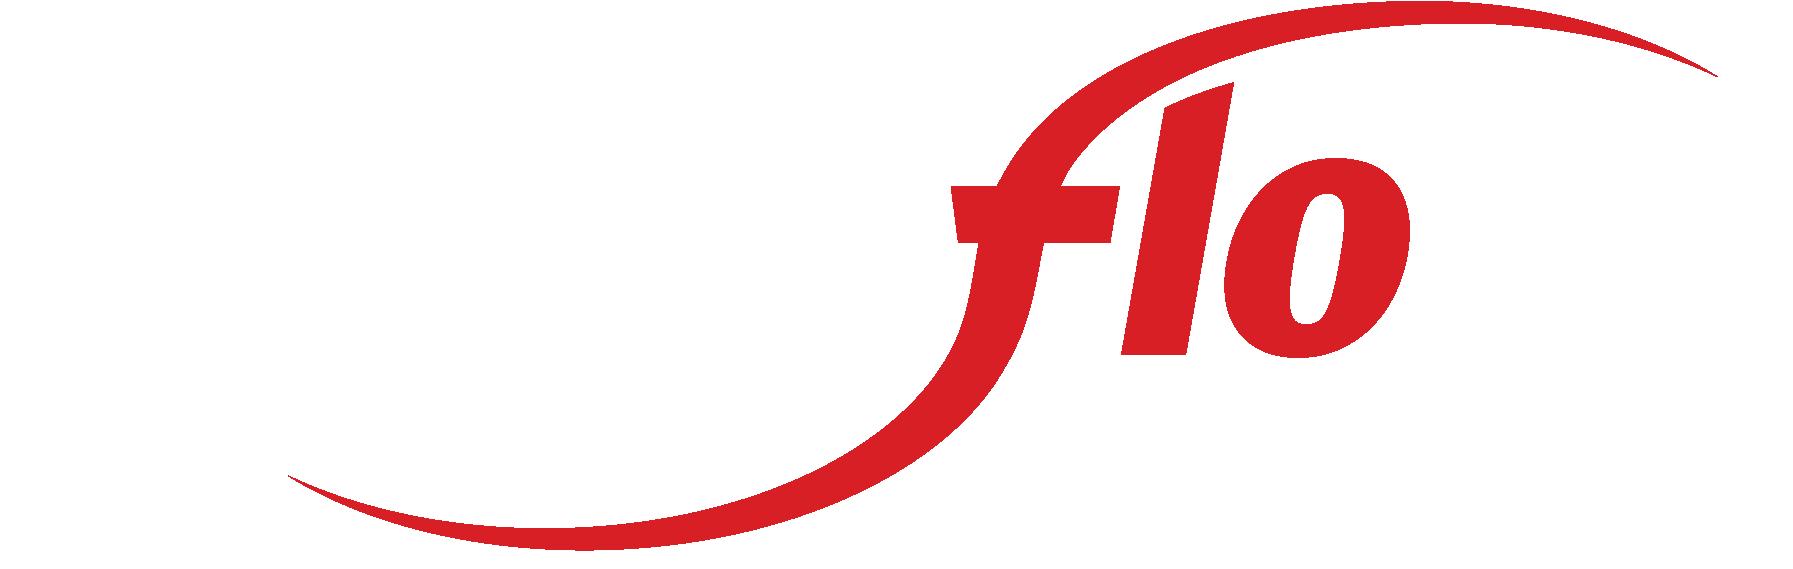 SlurryFlo Valve Corp. Logo